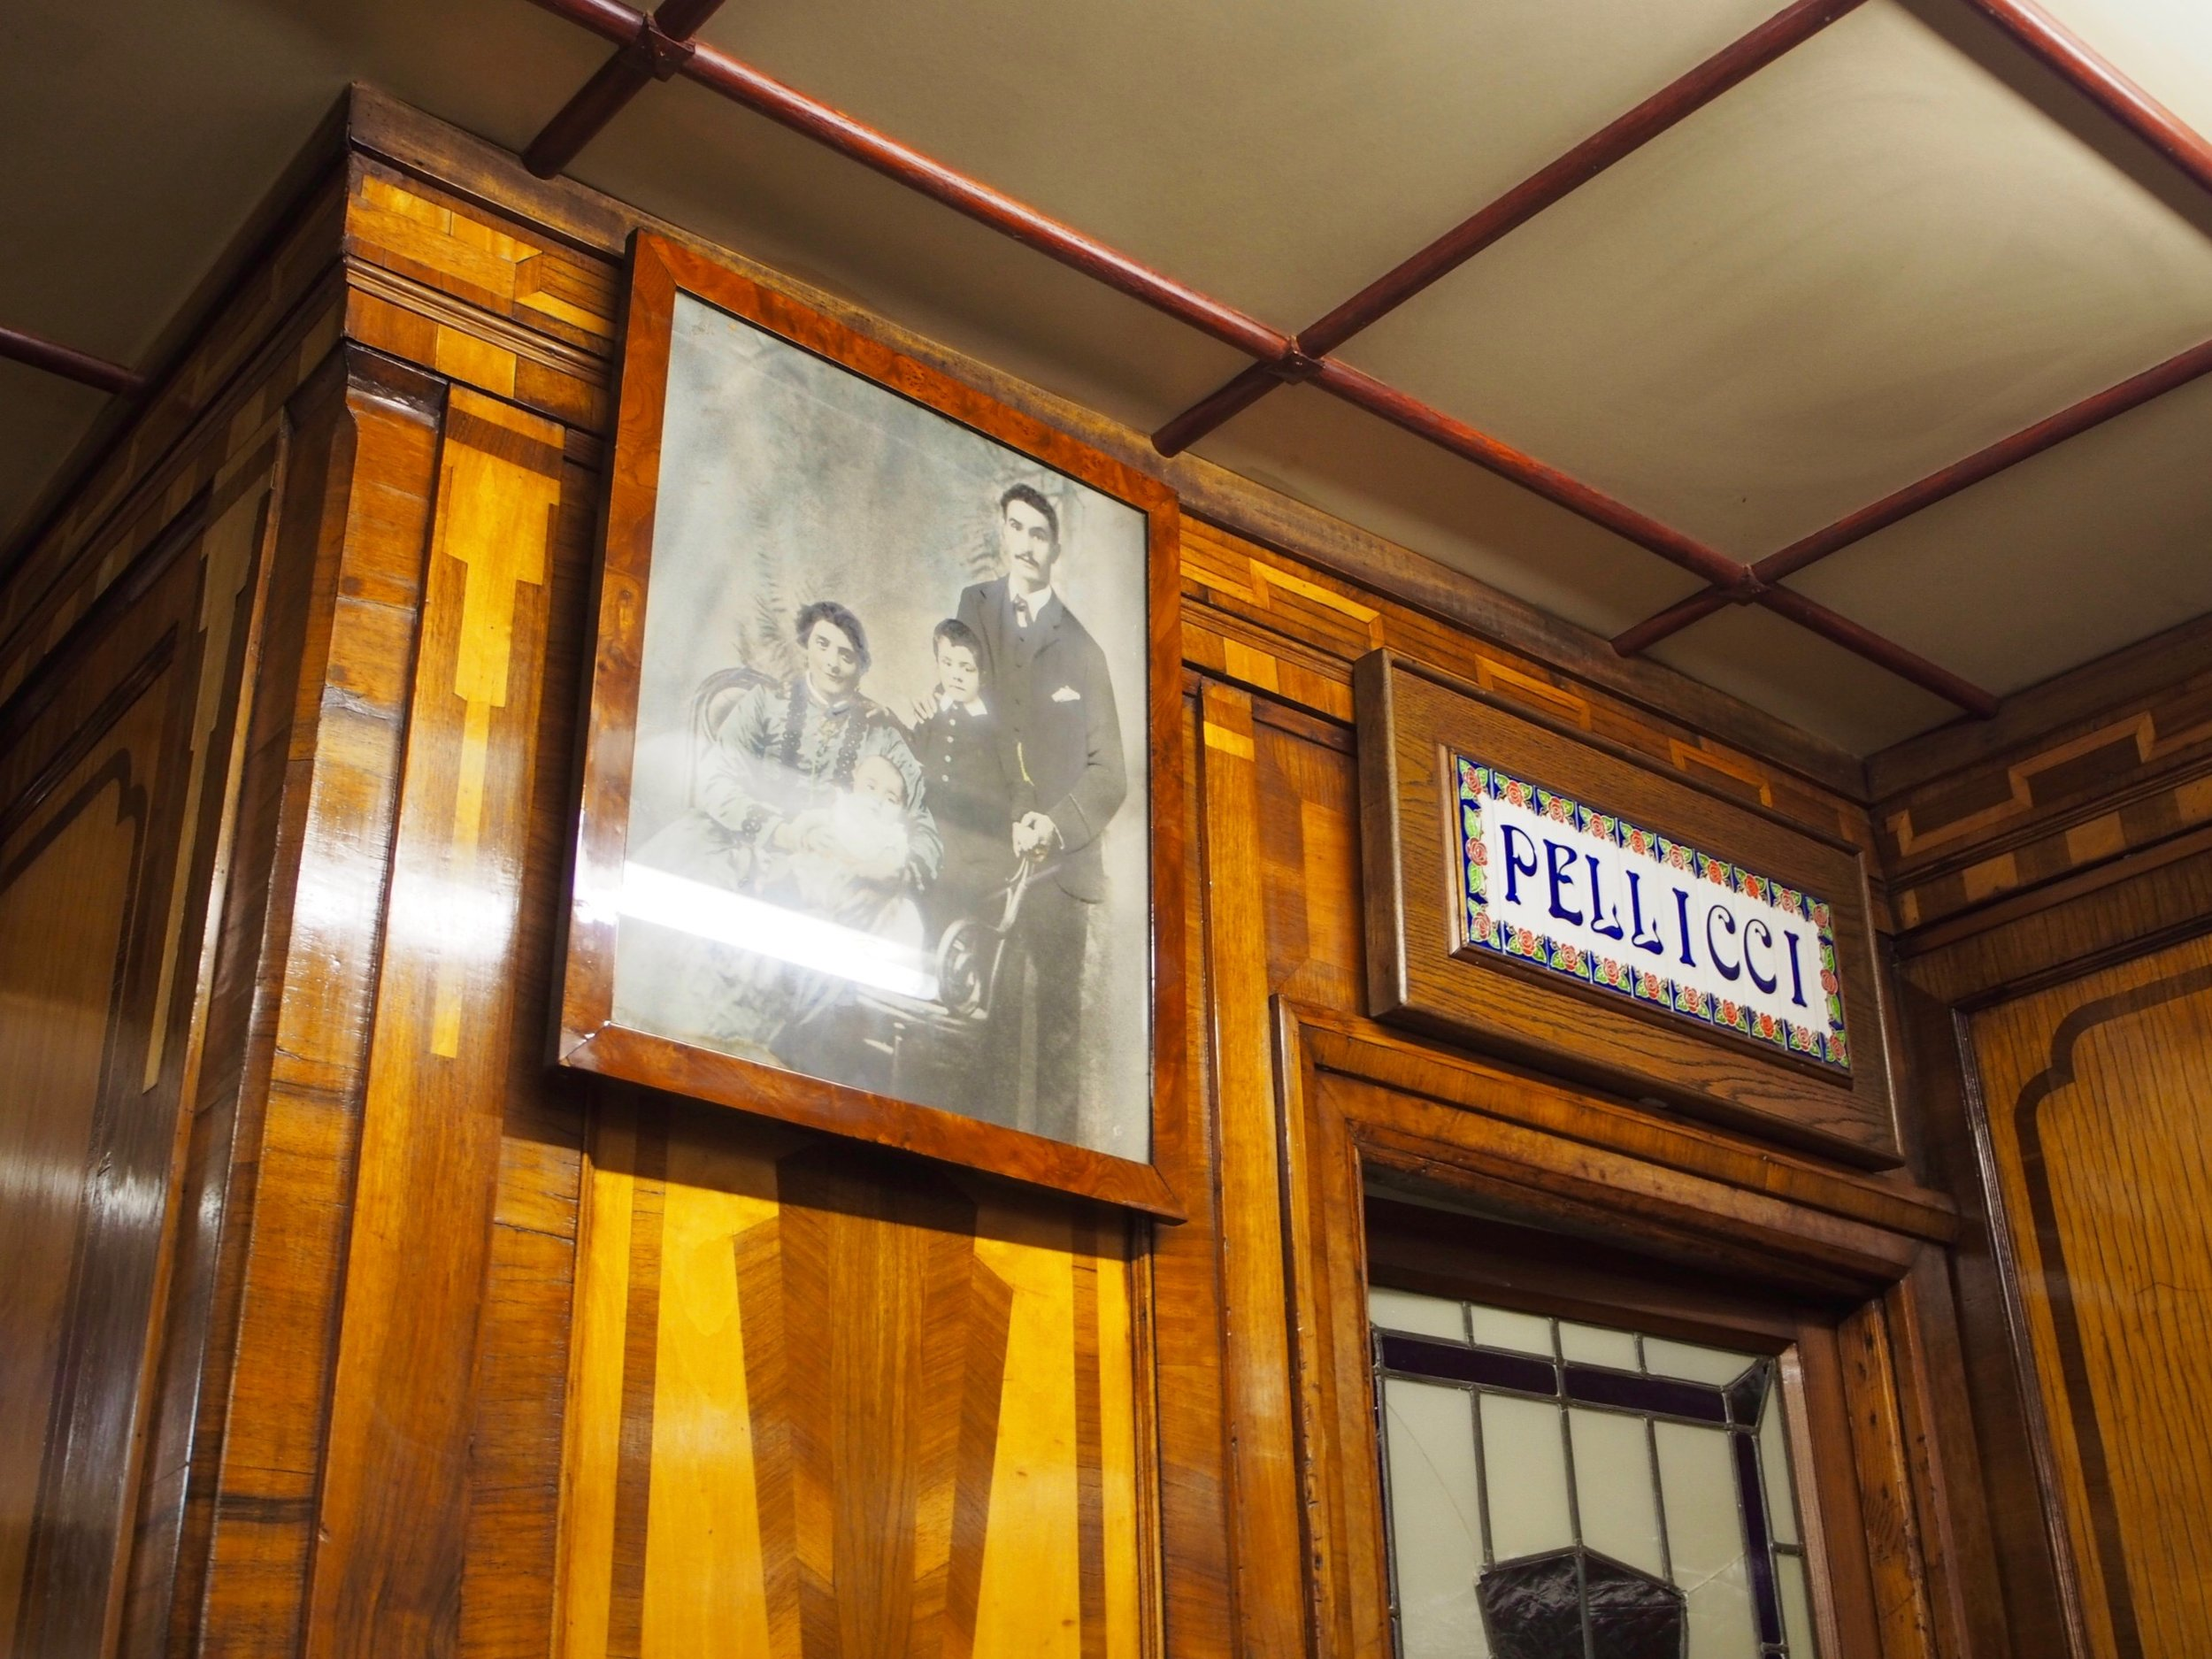 Pellicci's, a must visit in White Chapel